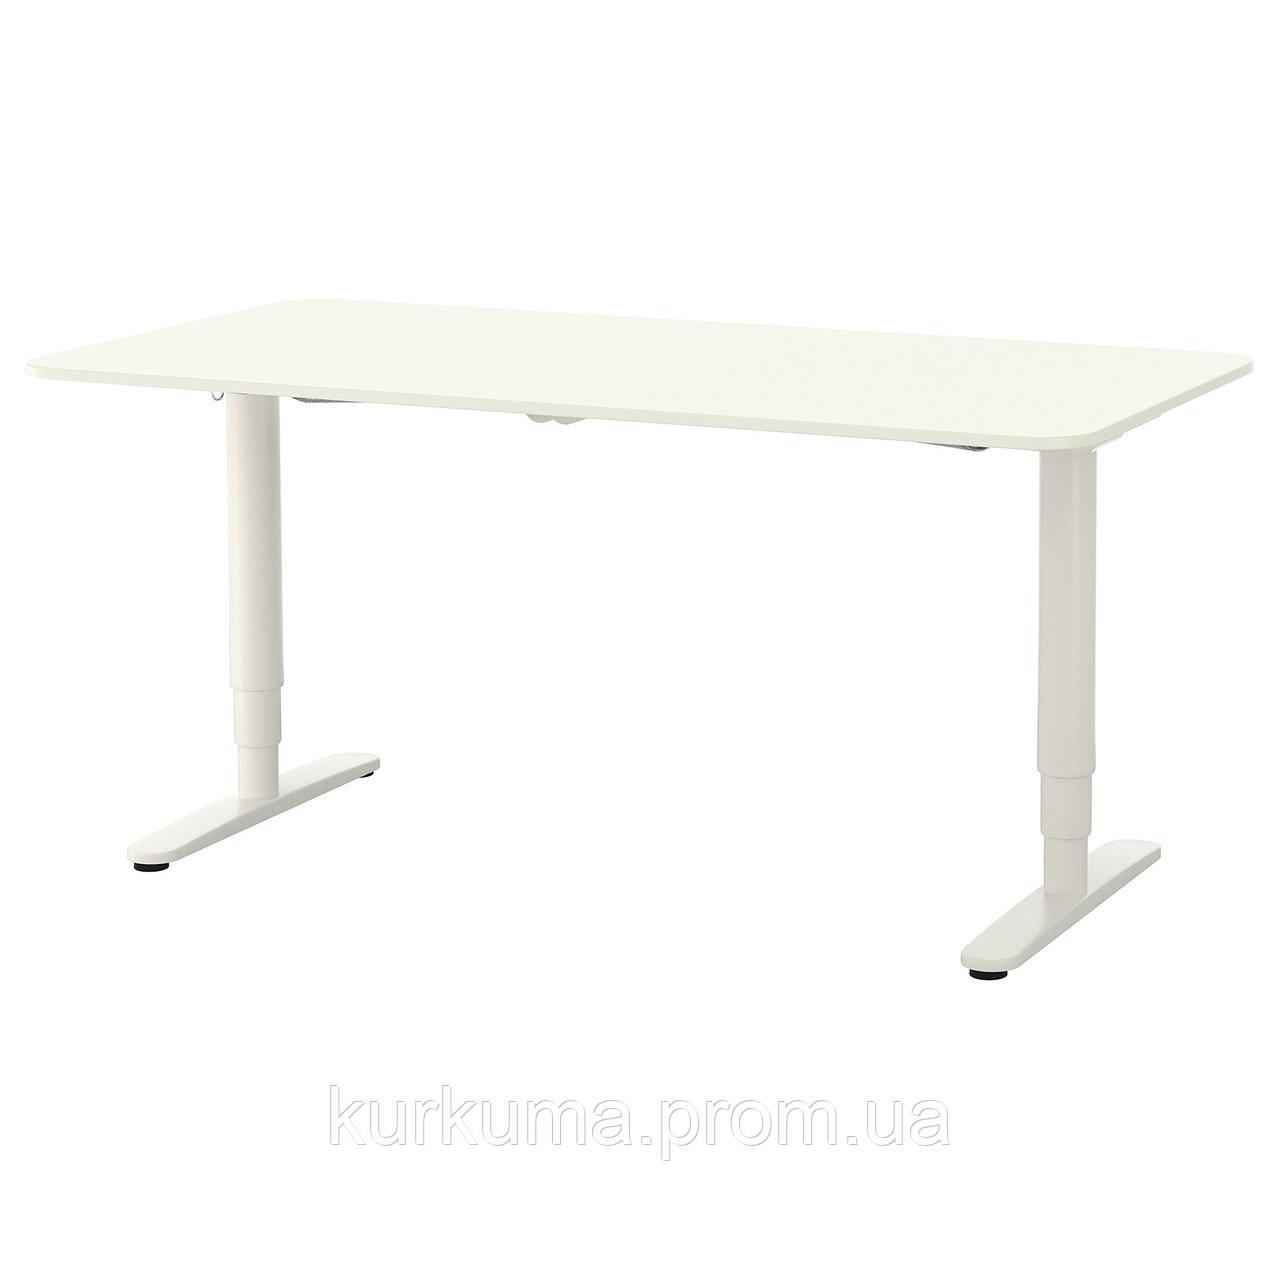 IKEA BEKANT Рабочий стол, регул. высота, белый  (690.225.37)